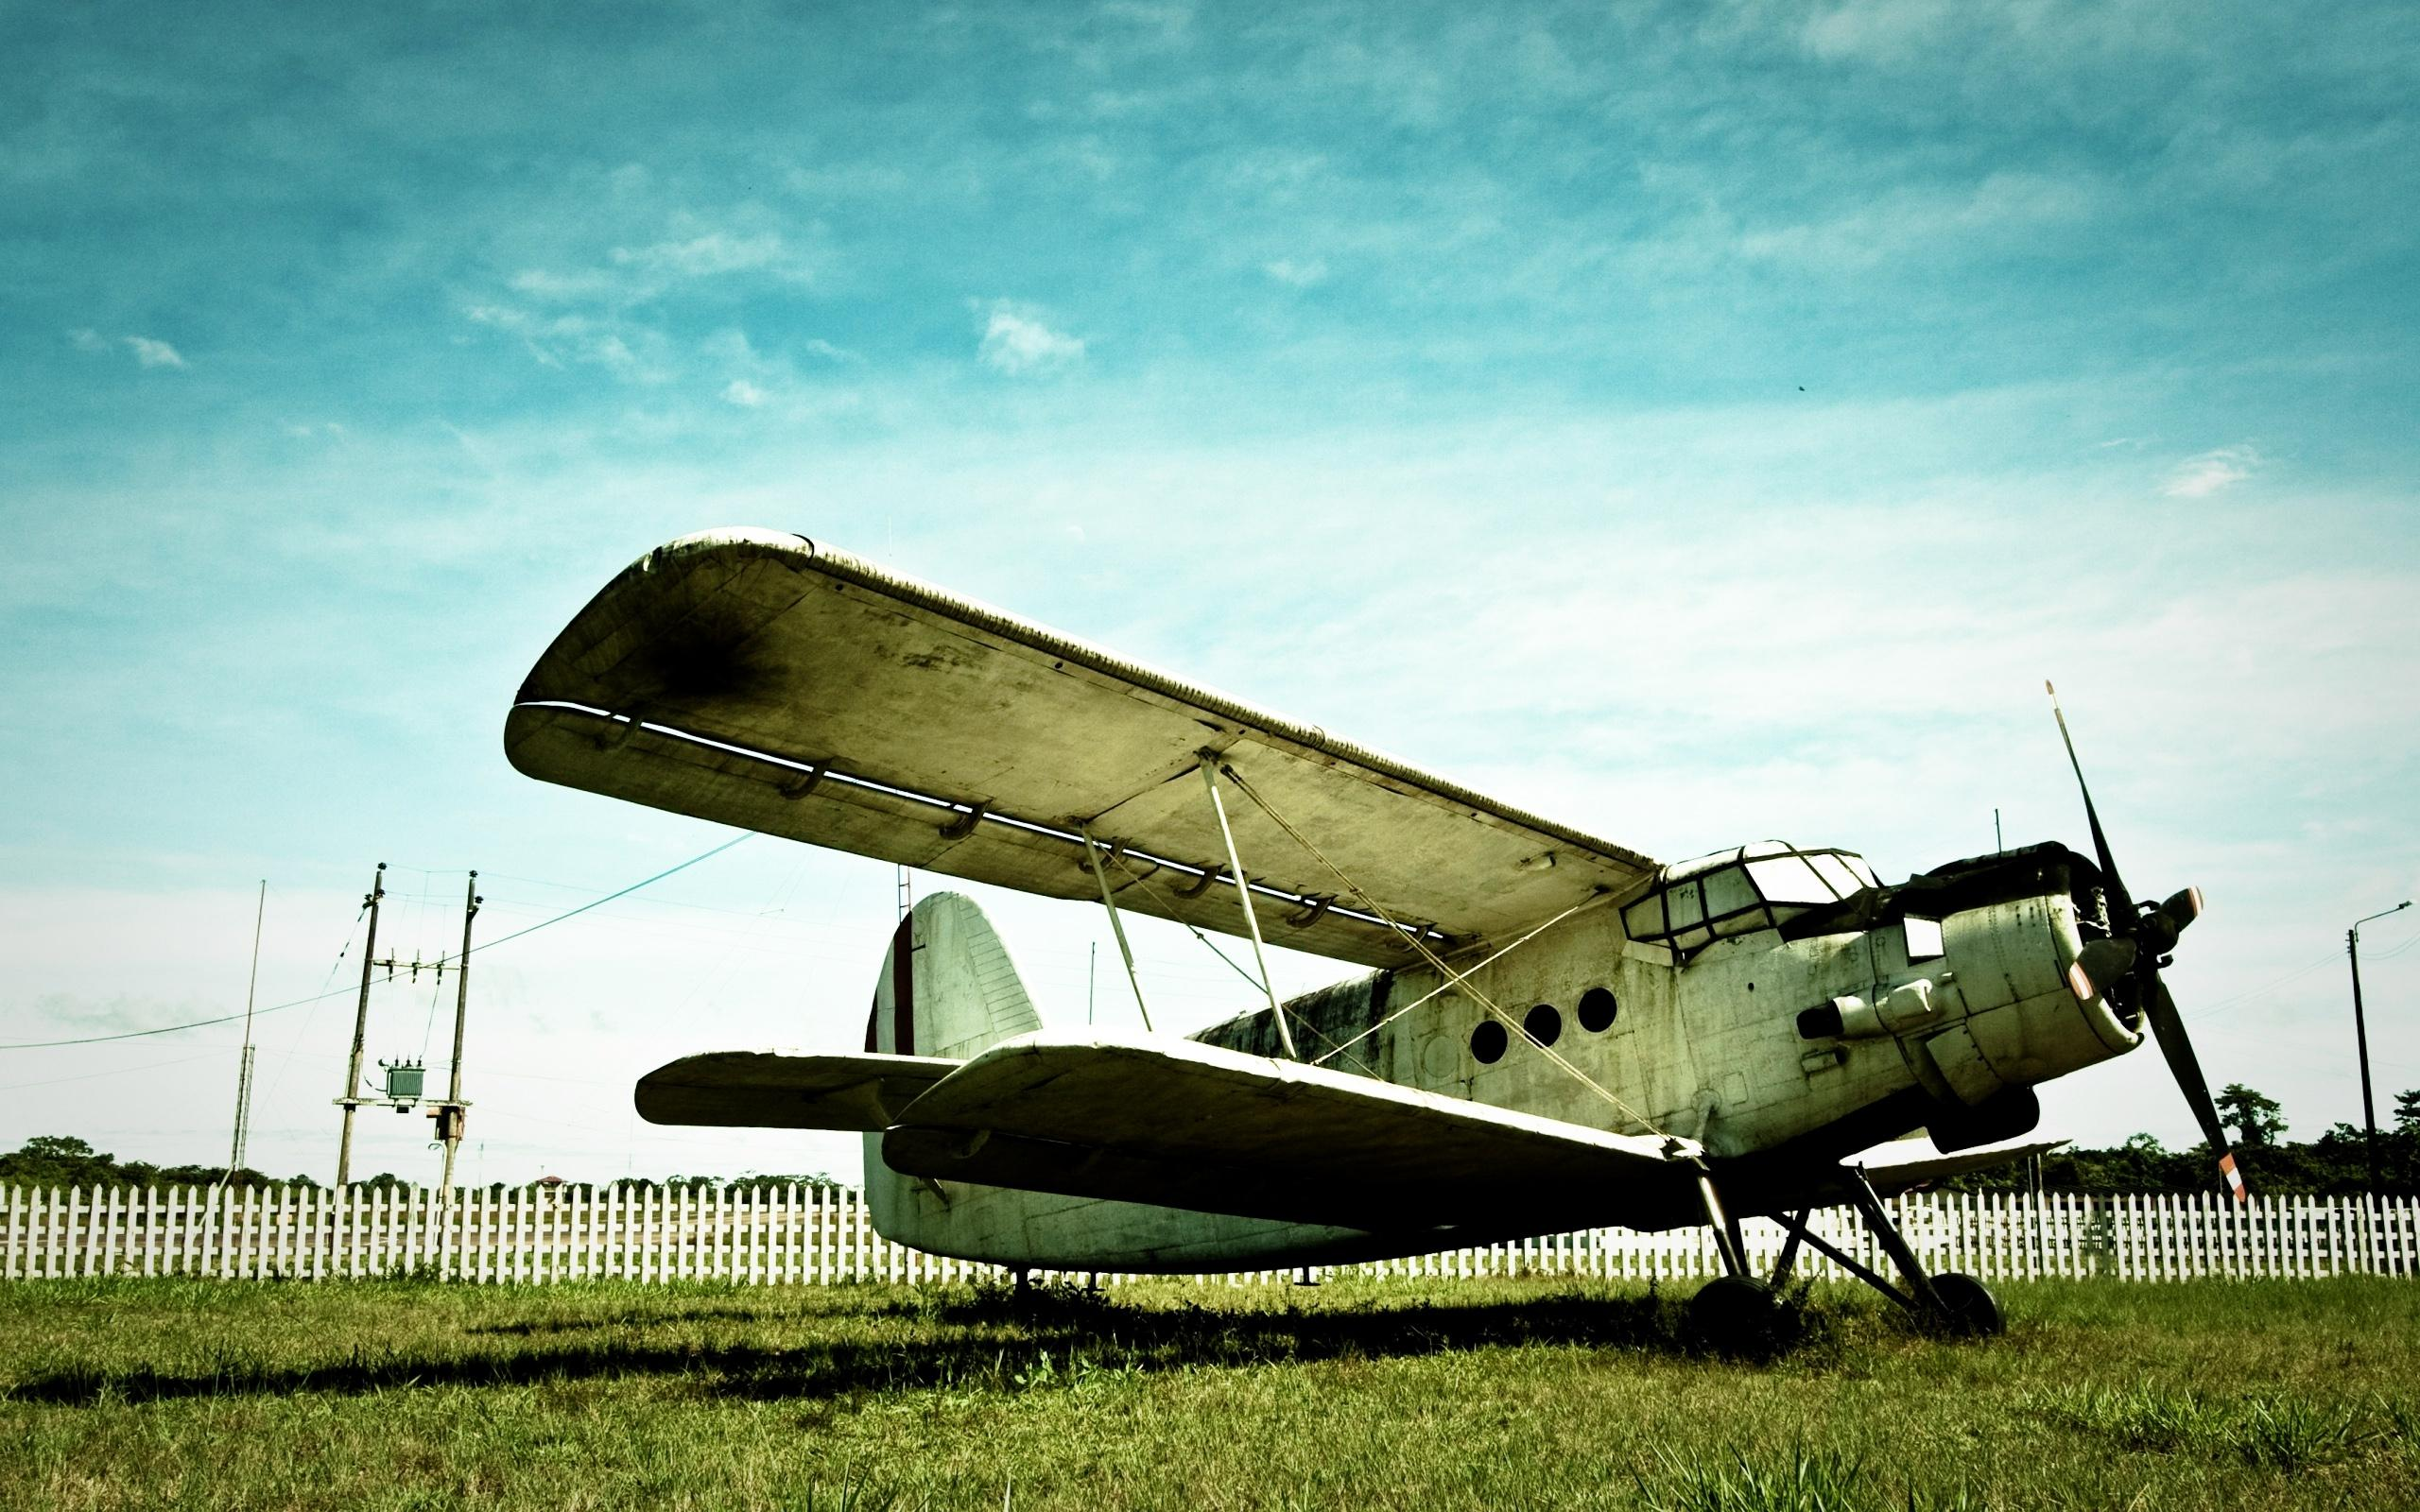 Vintage Airplane Wallpapers 2560x1600